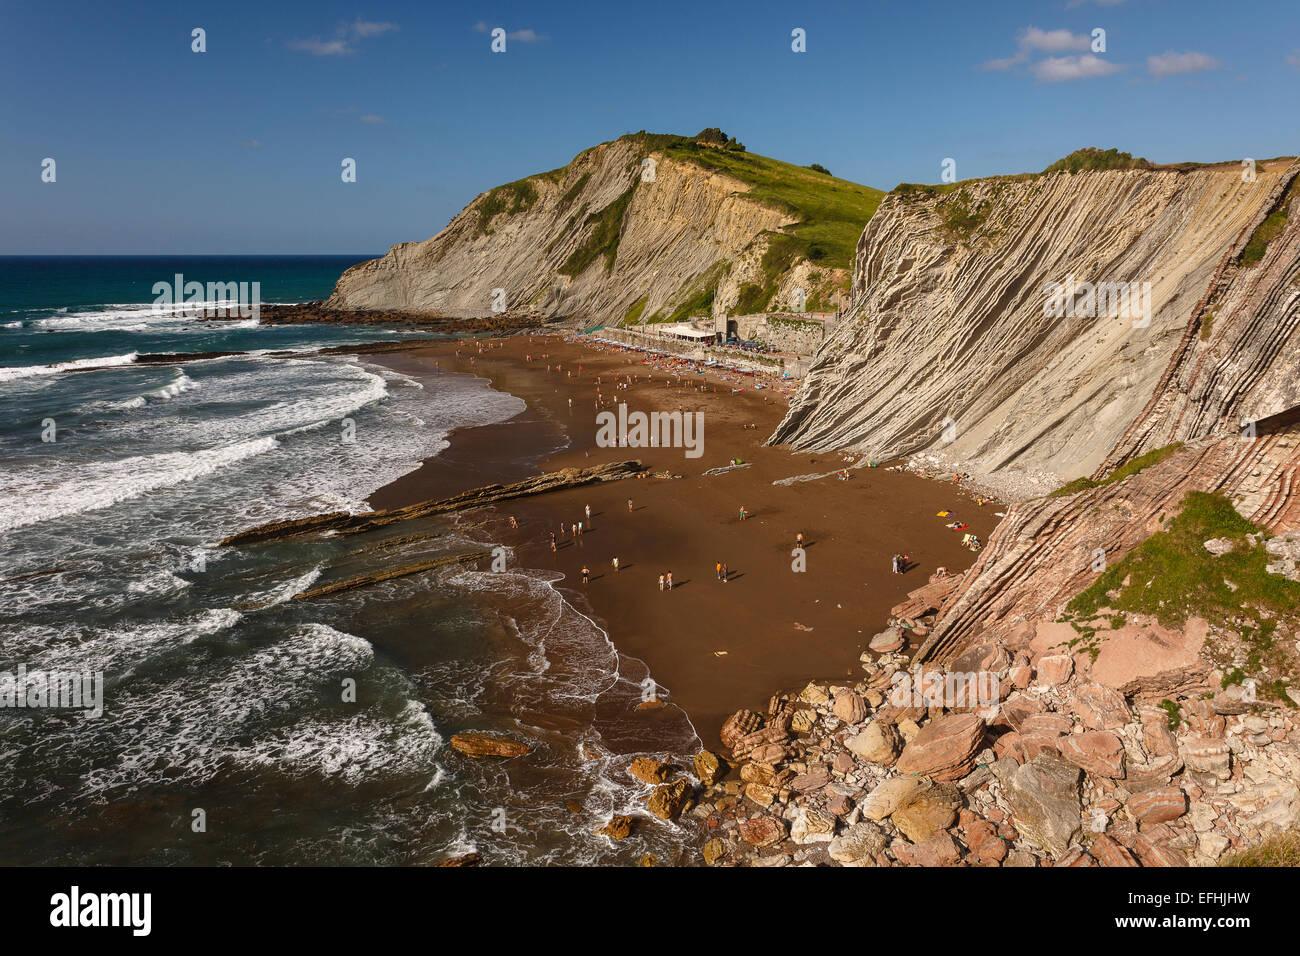 Beach of Zumaia village. Euskadi. Basque country. Spain. Europe - Stock Image